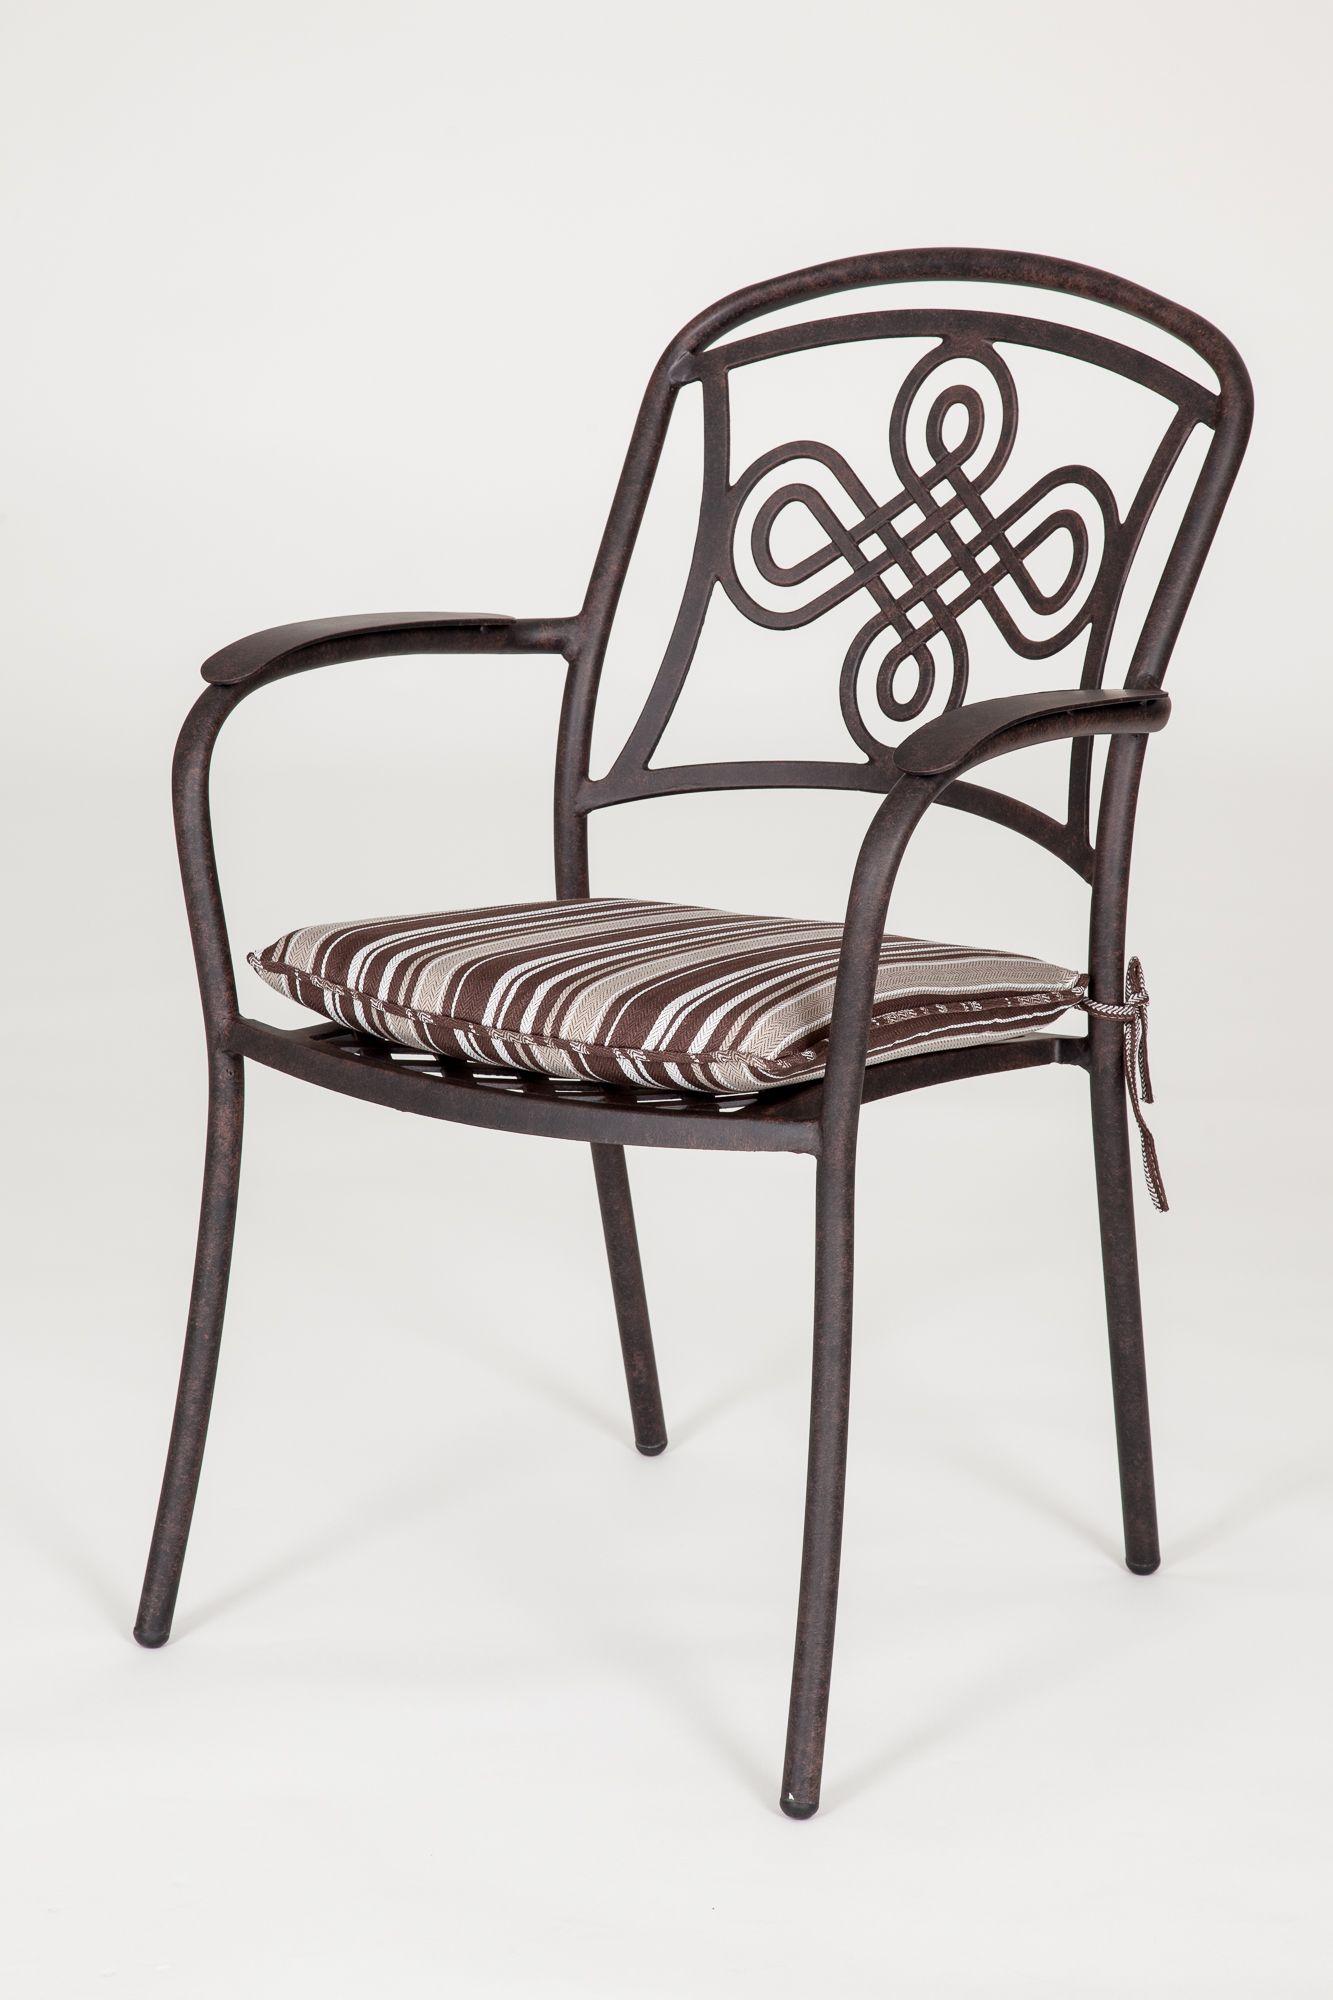 Cast aluminum patio furniture metal garden furniture brompton garden chairs range